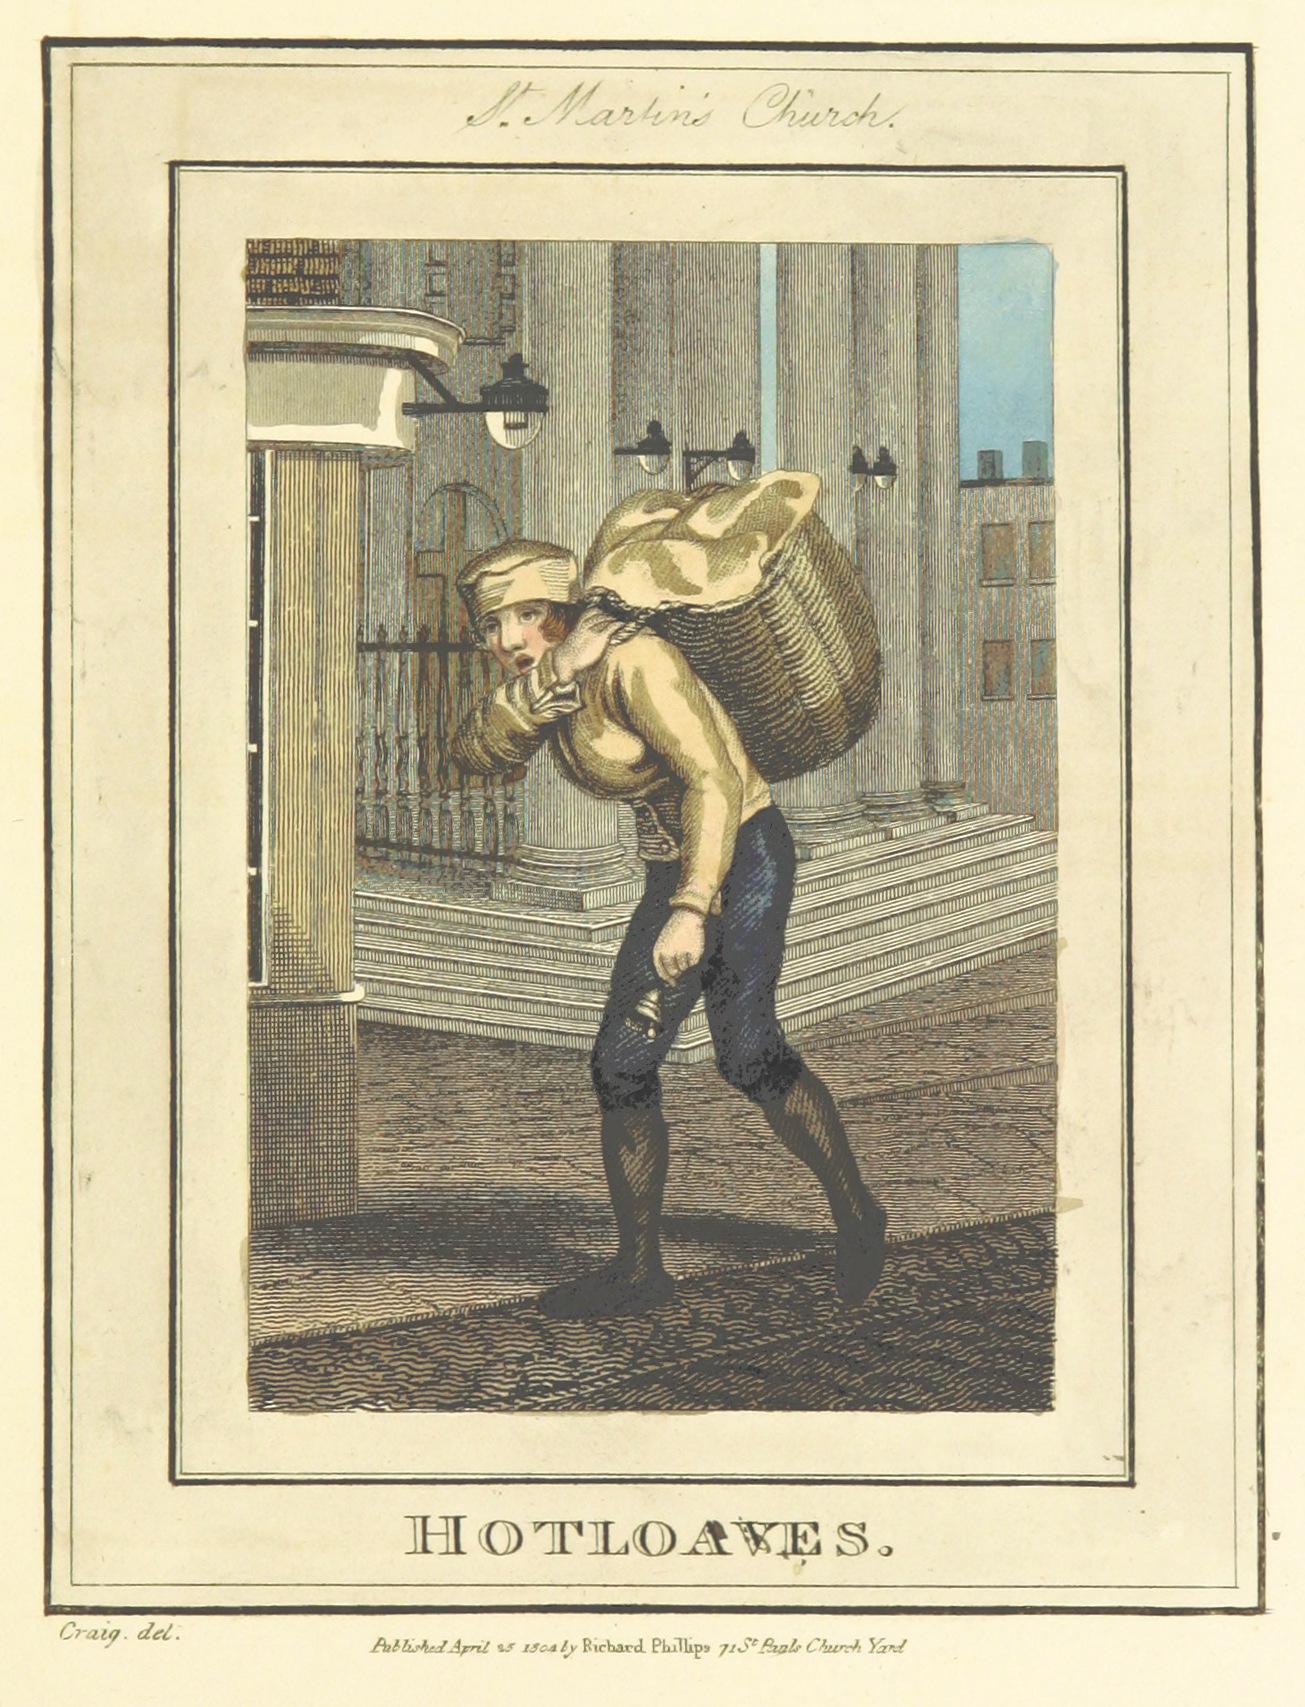 Phillips(1804)_p605_-_St_Martins_Church_-_Hotloaves